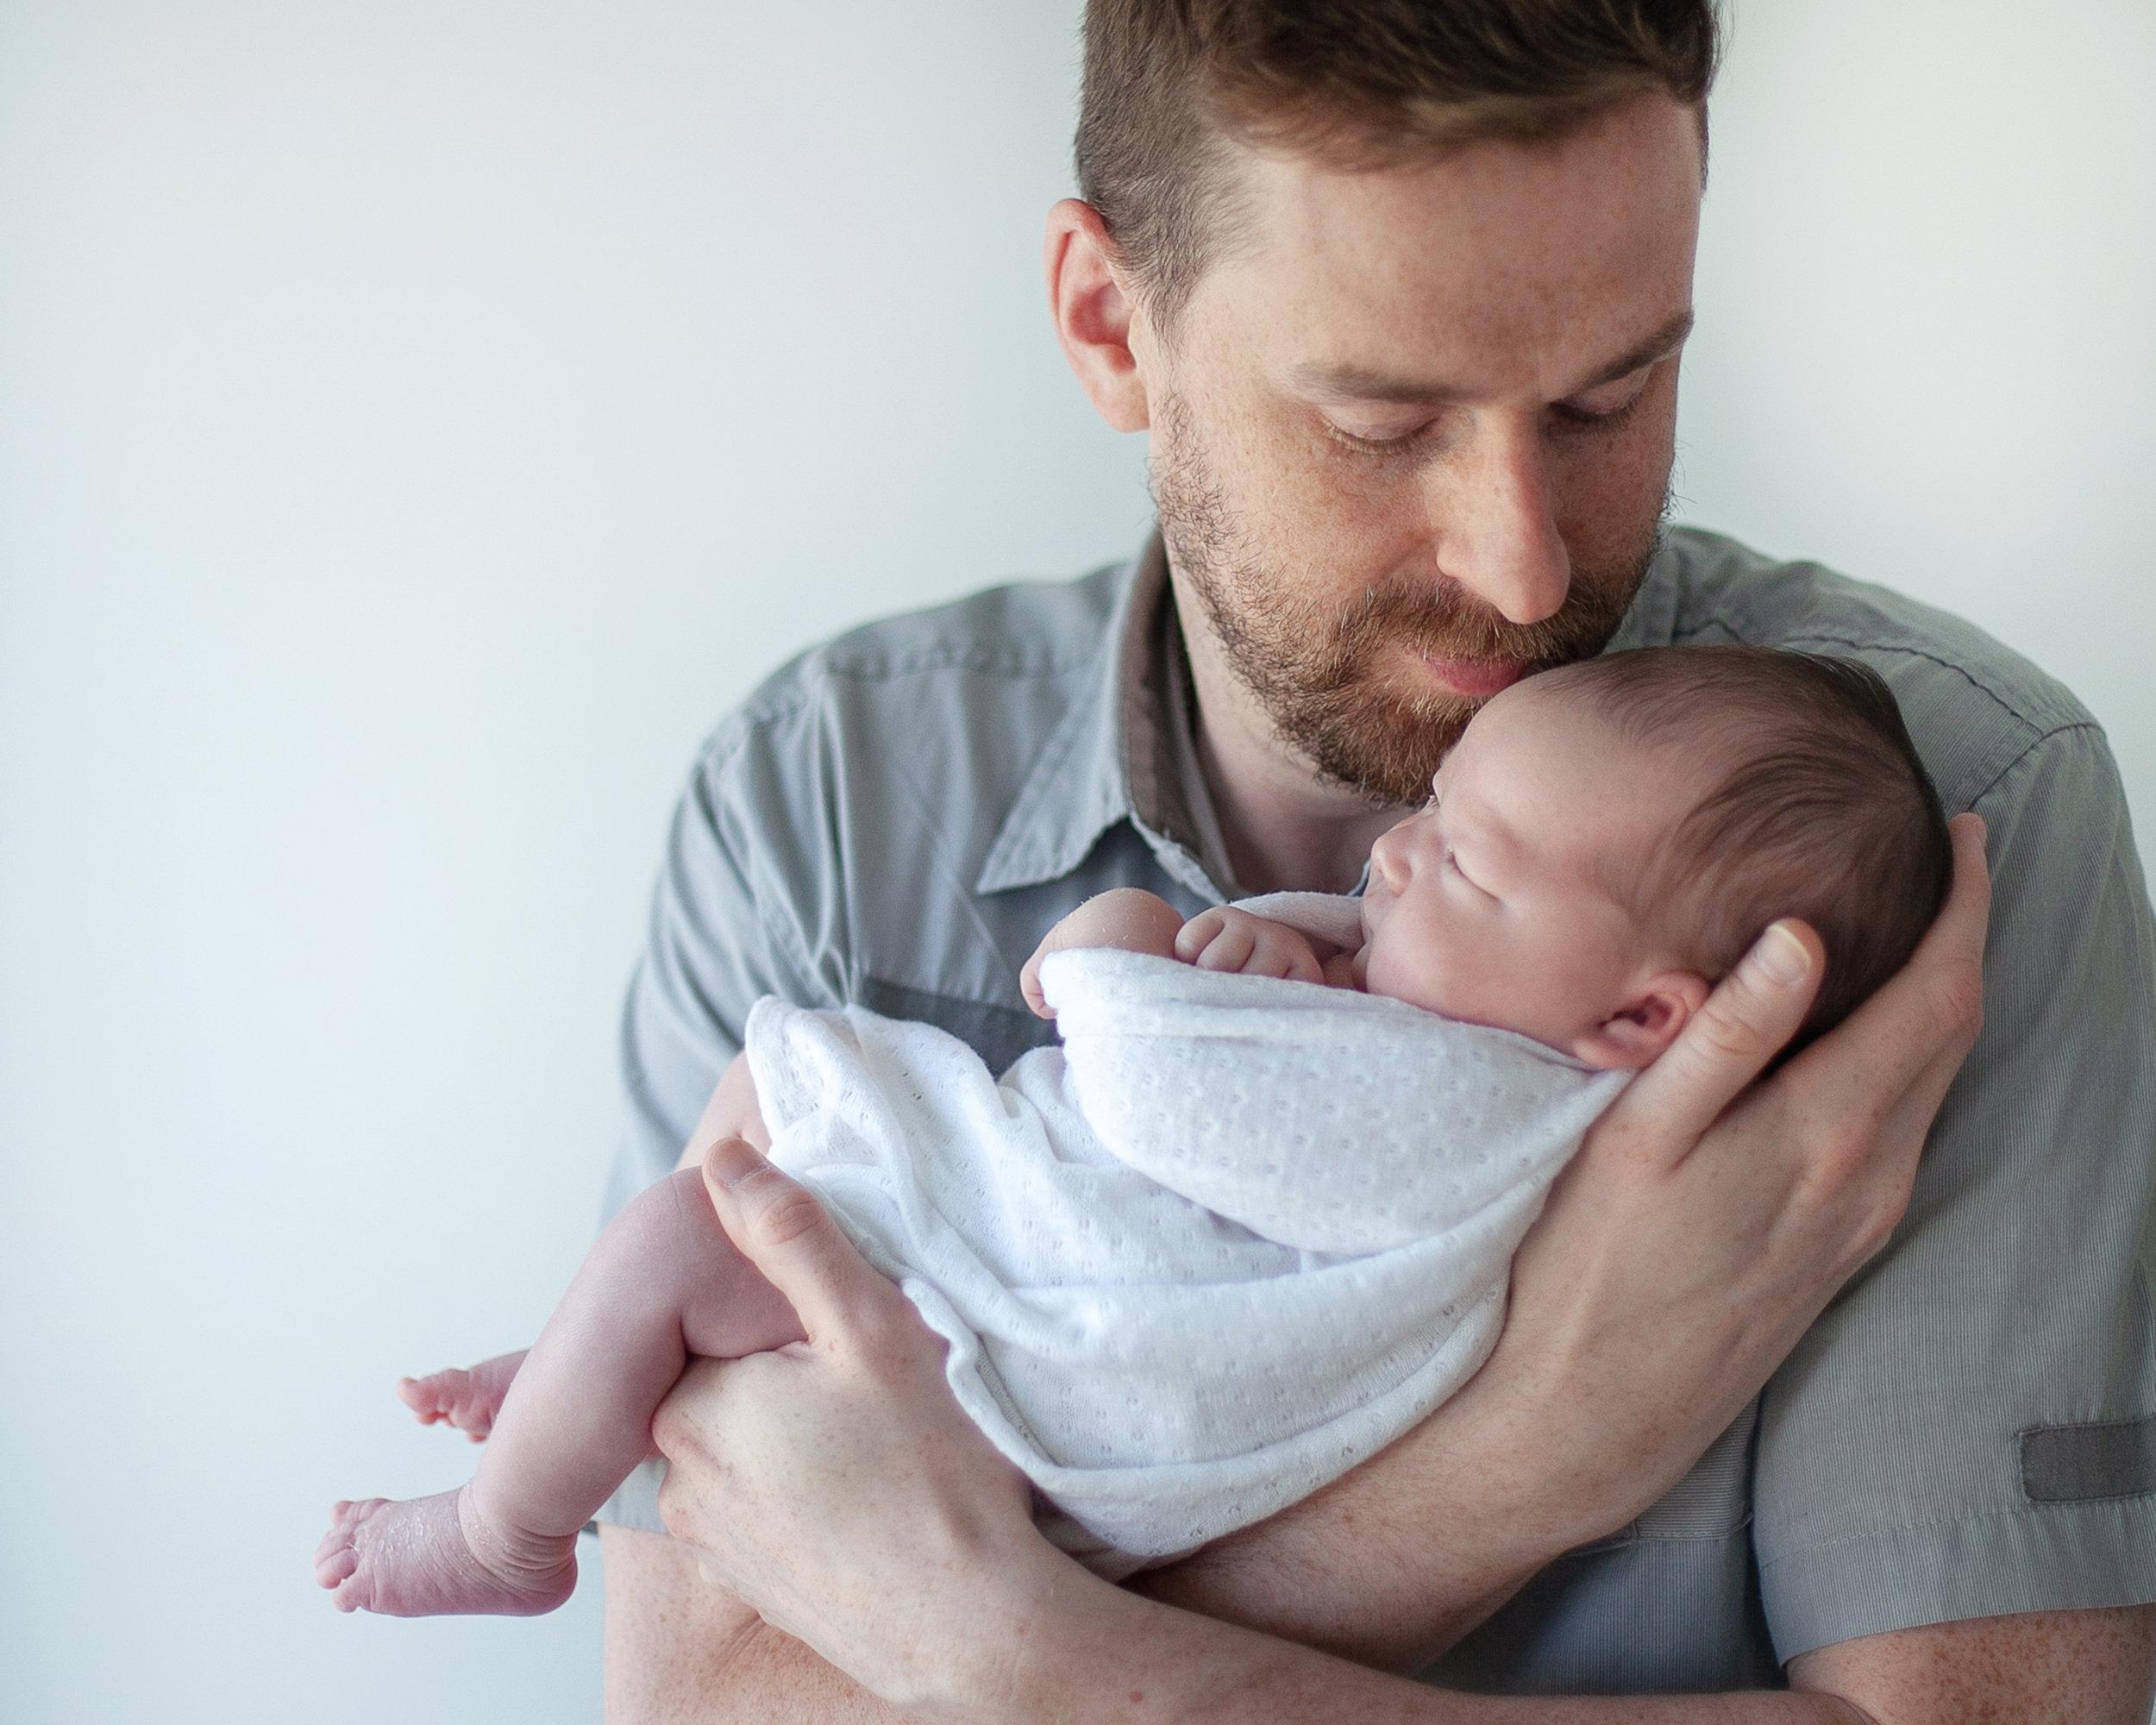 Oshawa_Toronto_Ajax_Dad_Baby_Photography_Studio_Petra_King_Photorgaphy